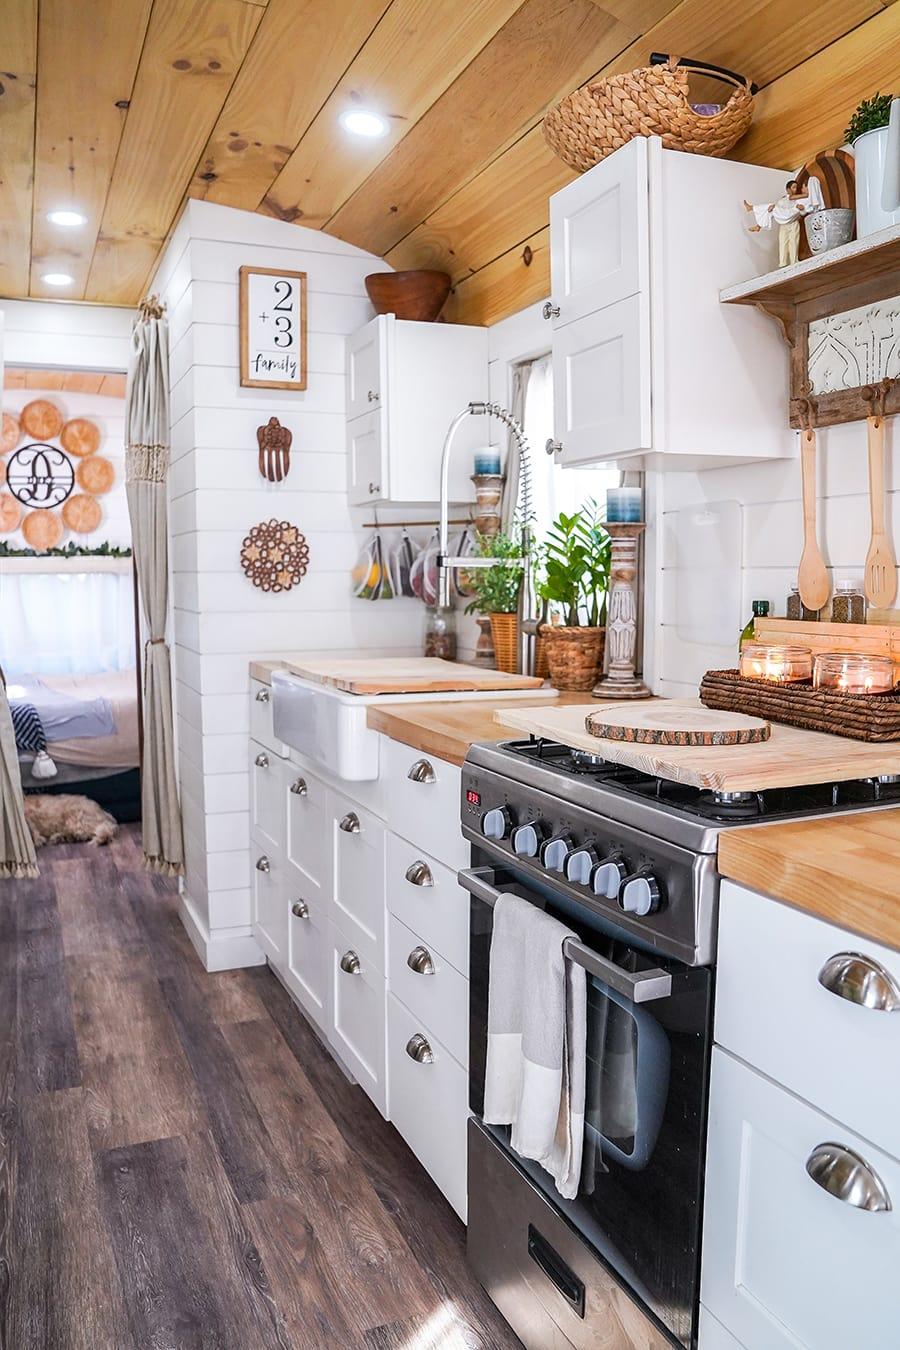 skoolie tiny kitchen @happyhomebodies